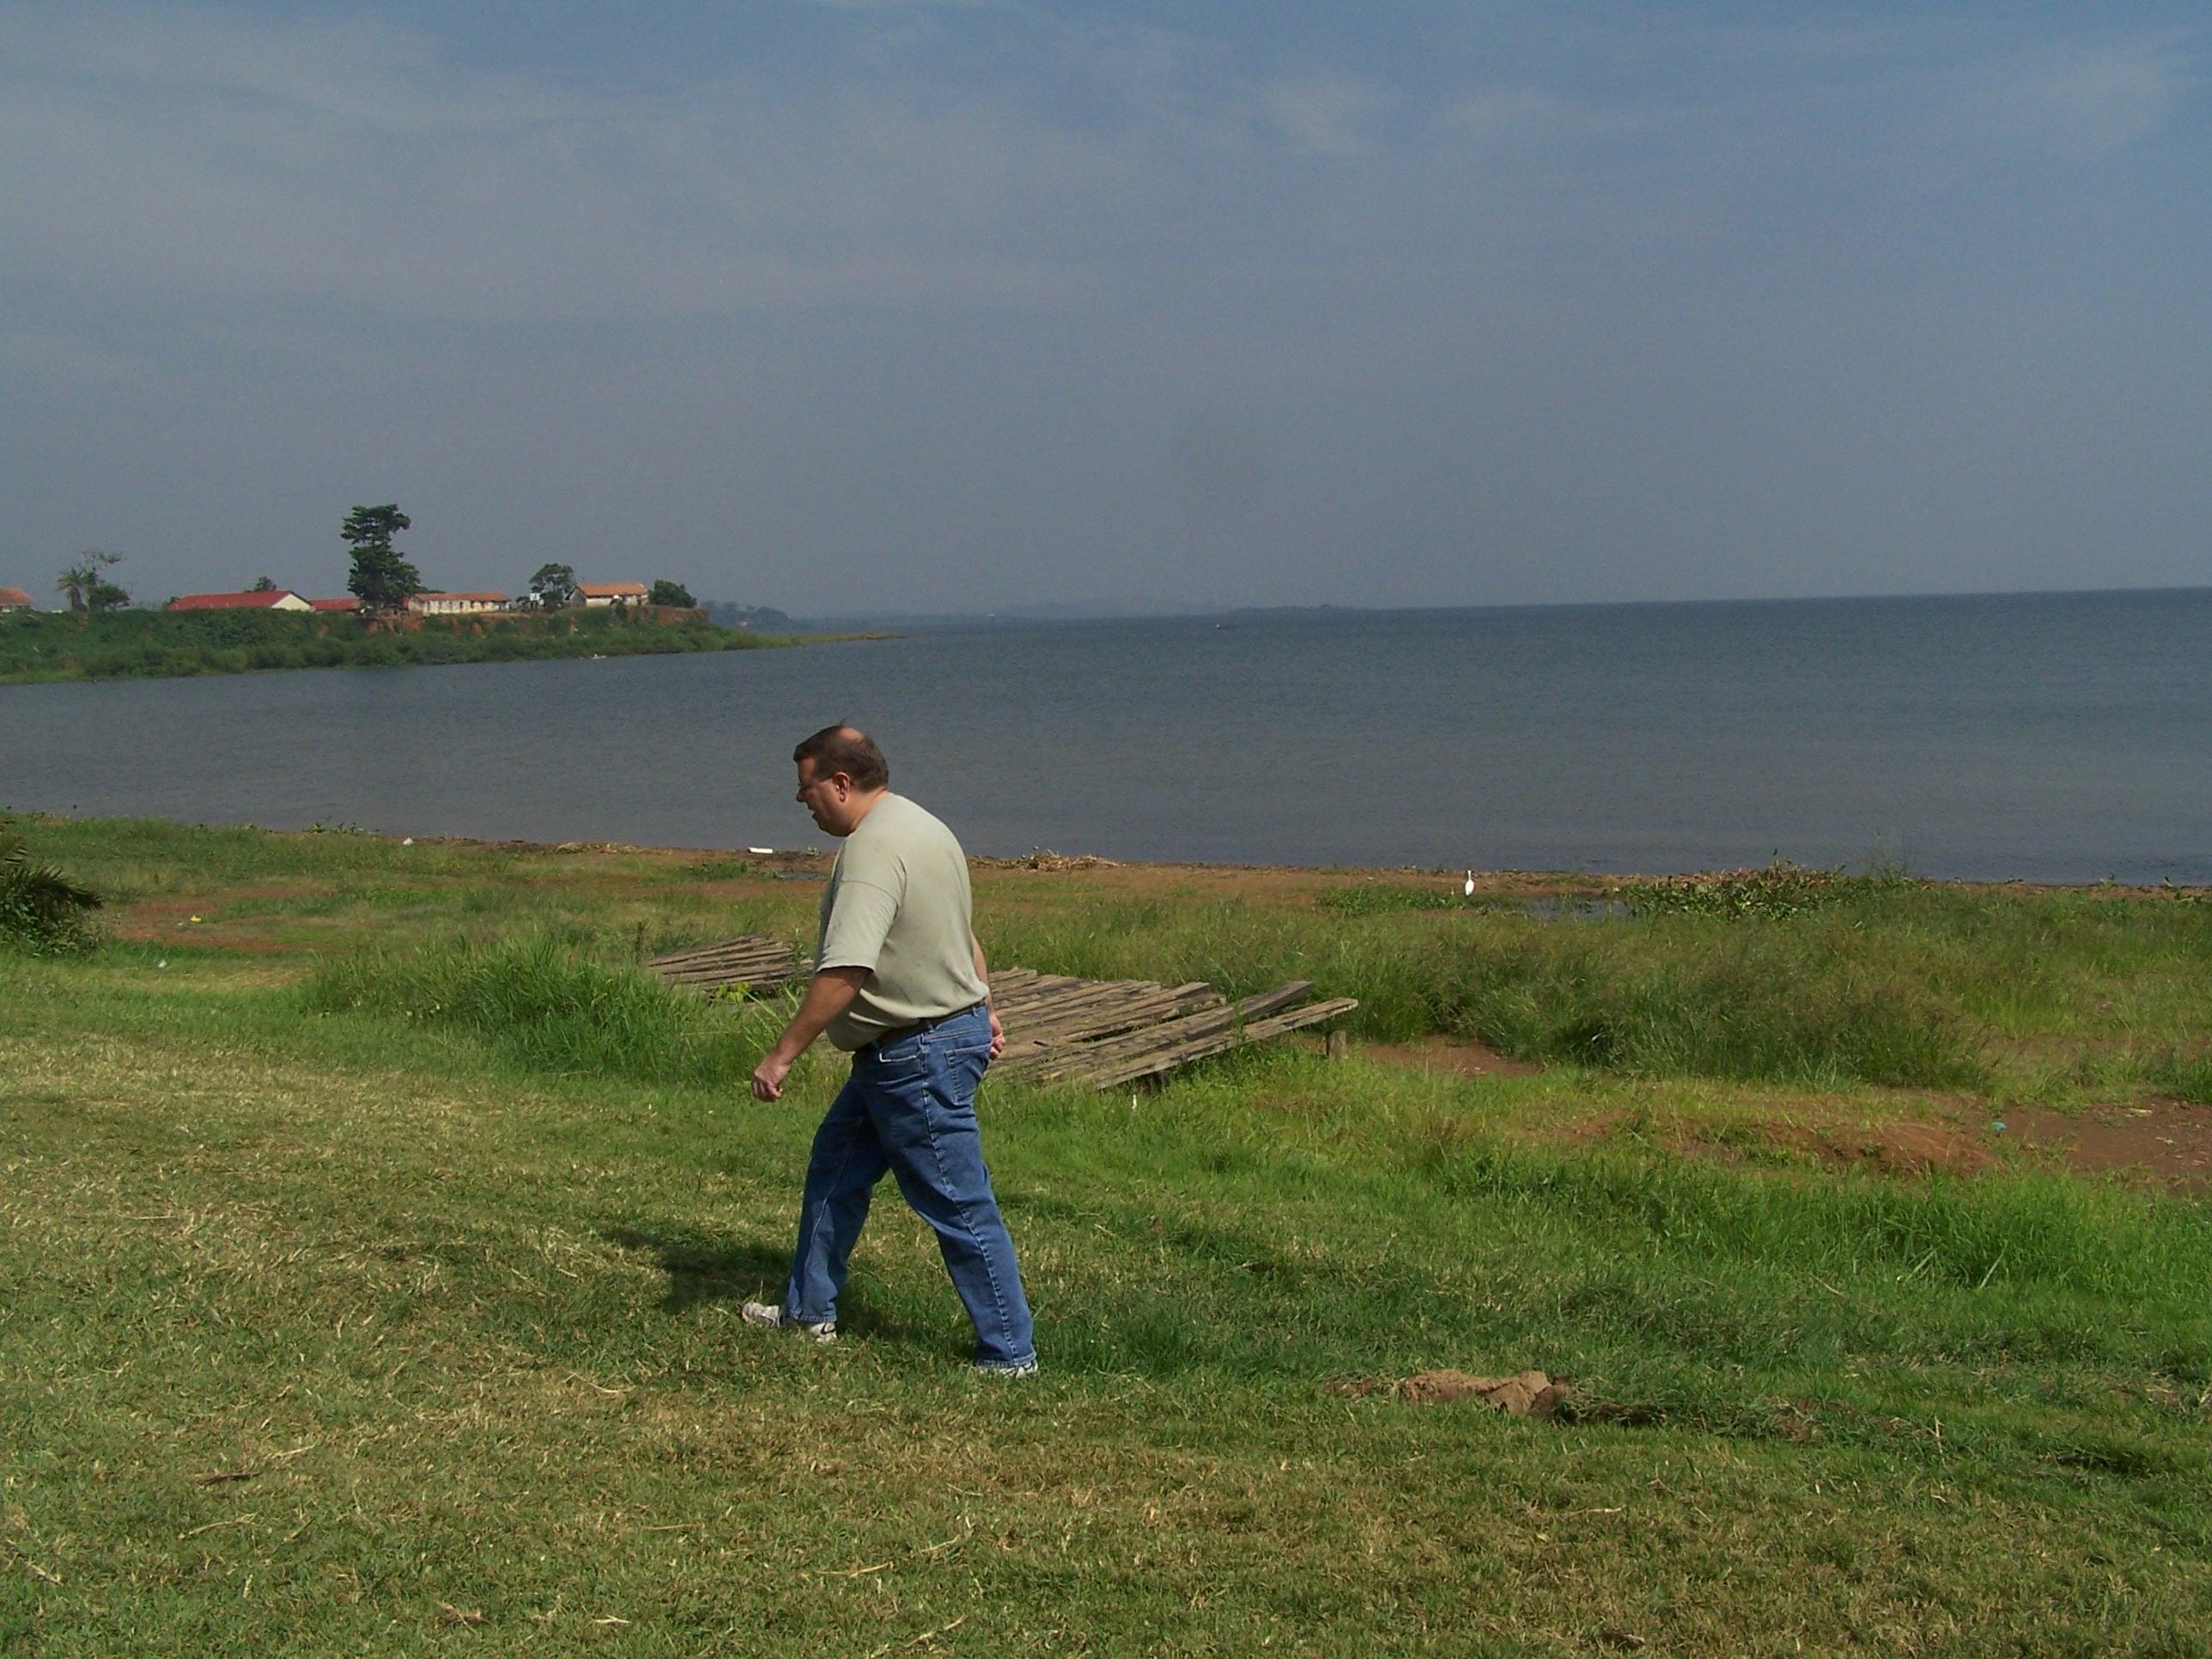 Evan Haglund on the shore of Lake Victoria, outside of Kampala